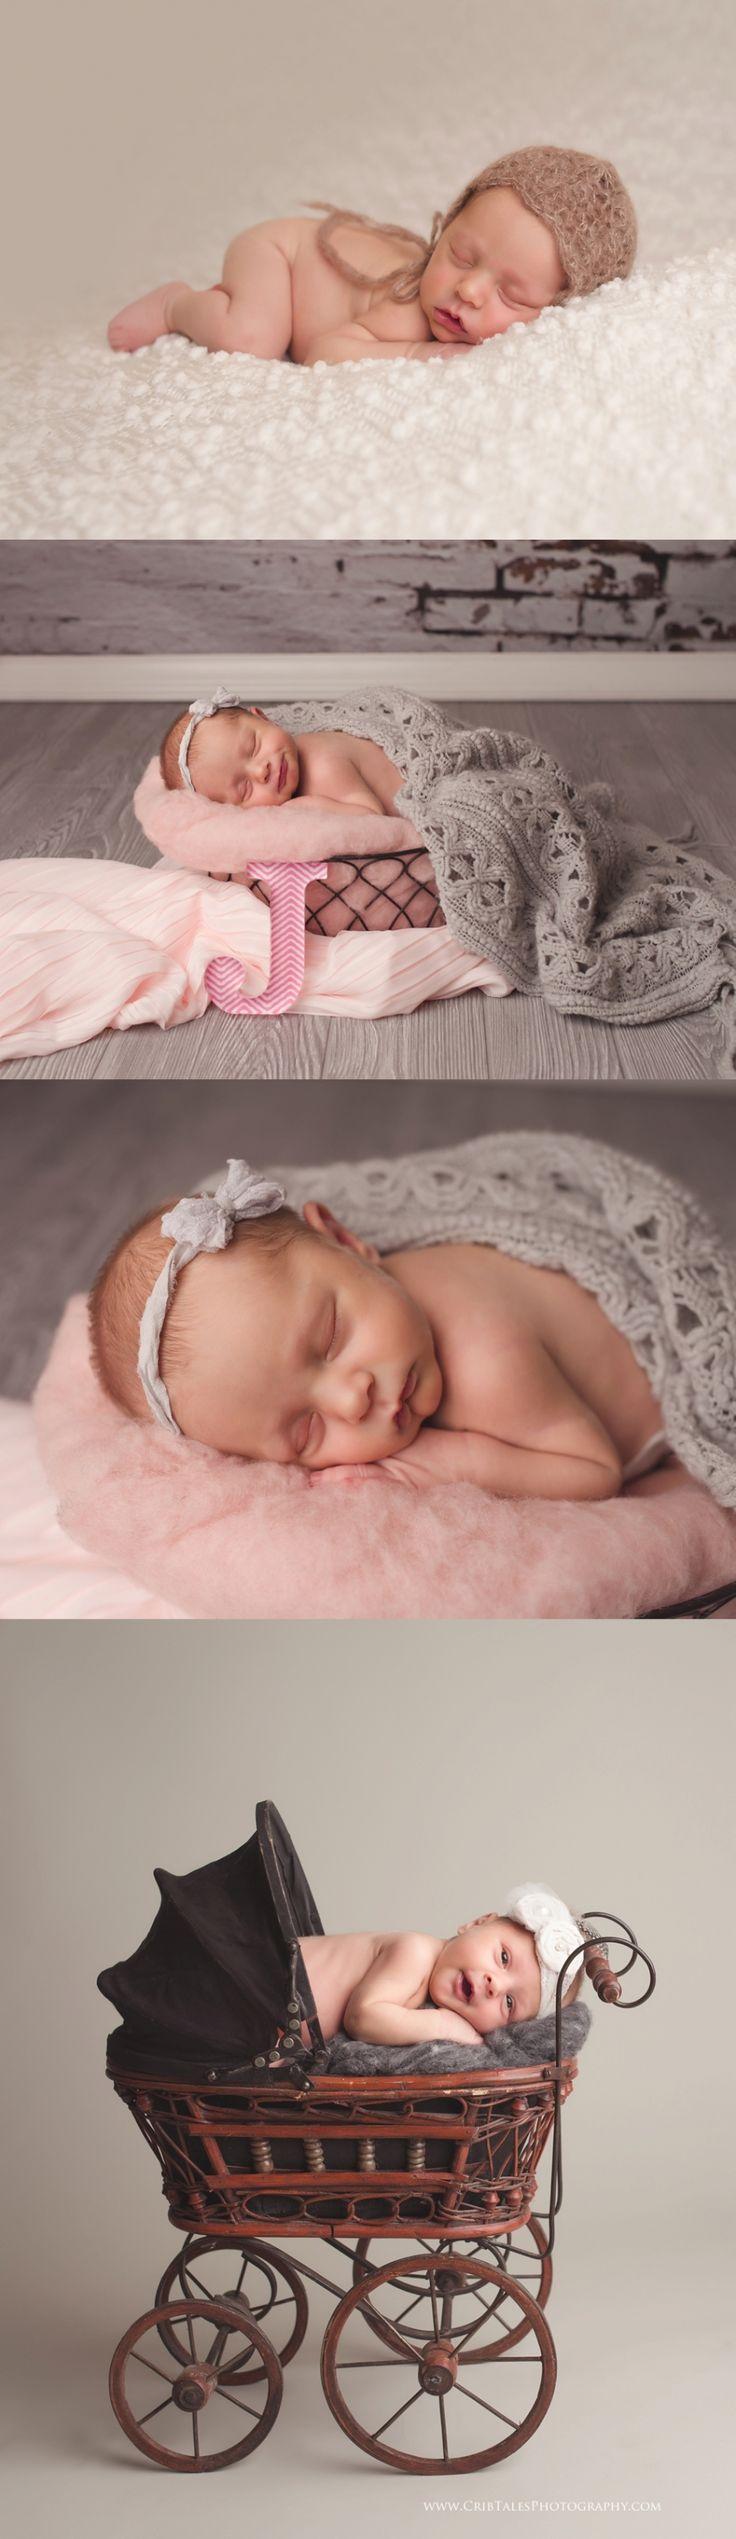 Baby cribs denver co - Castle Rock Colorado Premier Newborn And Child Photographer